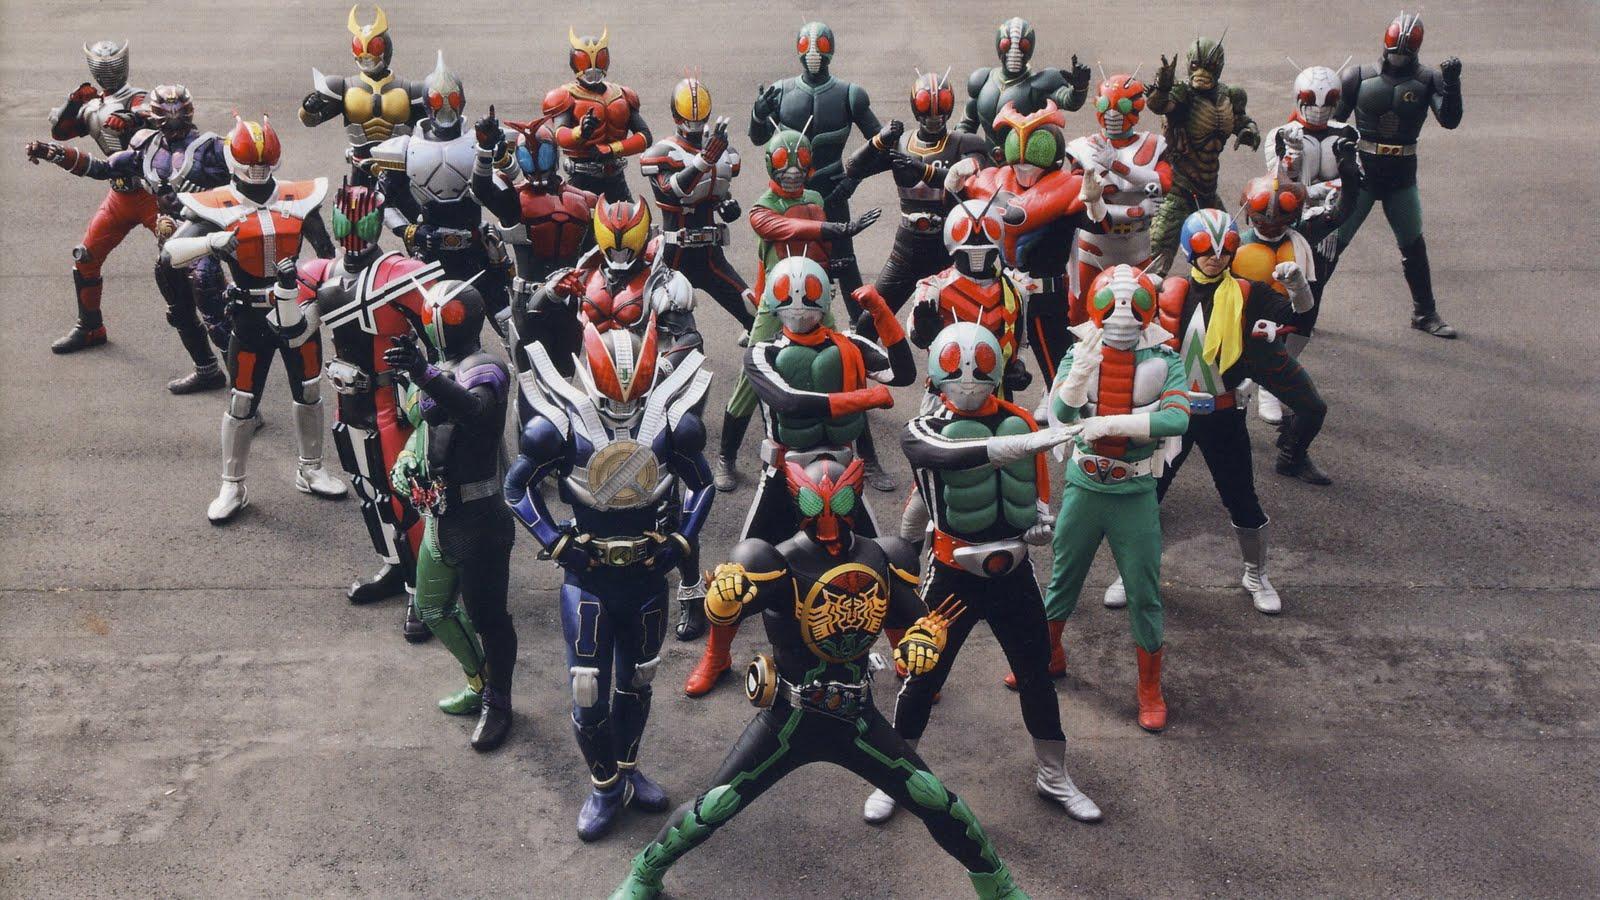 Kamen Rider gang